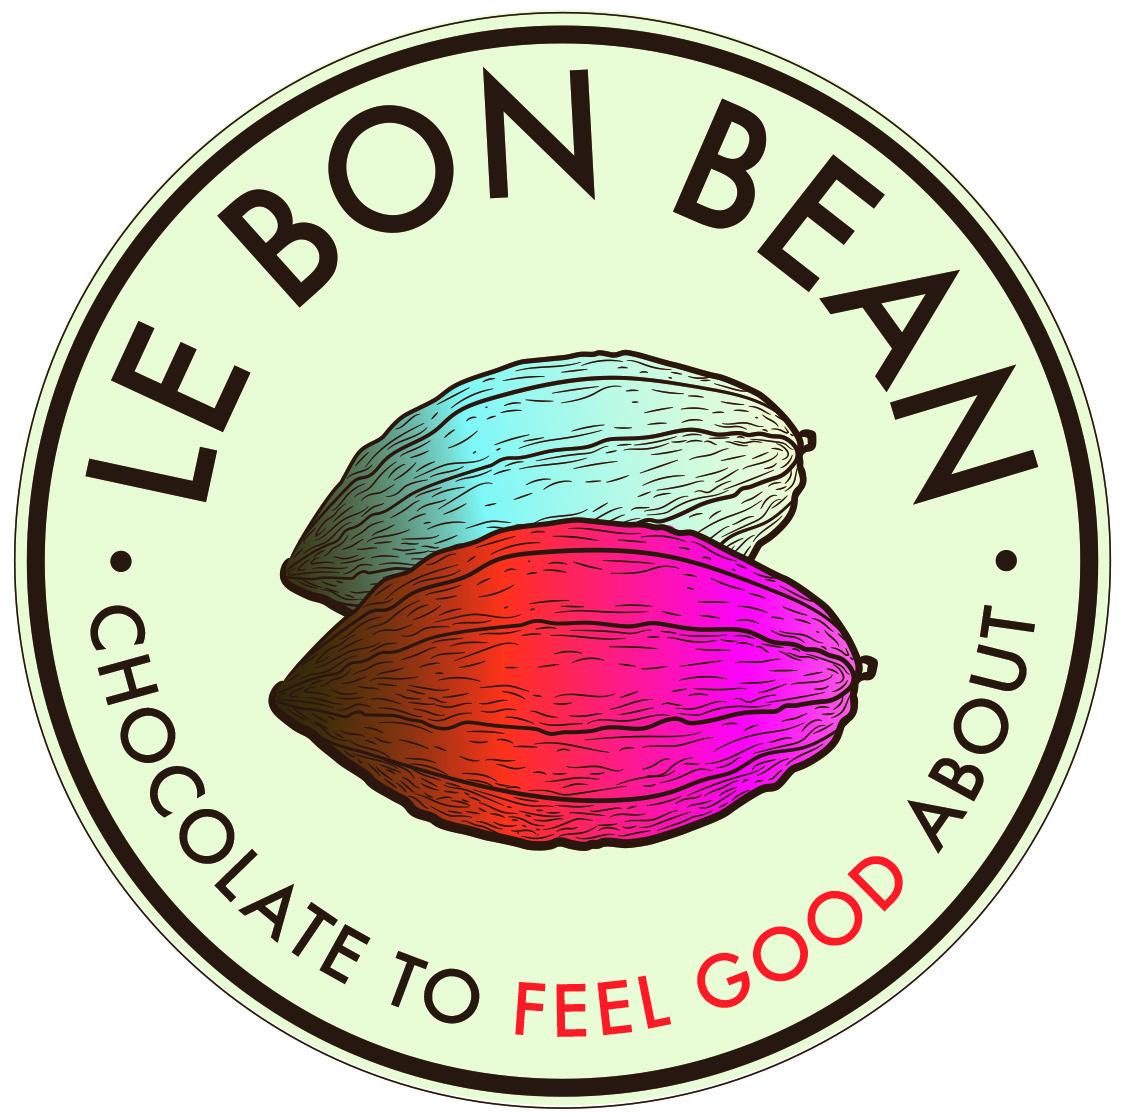 Le Bon Bean